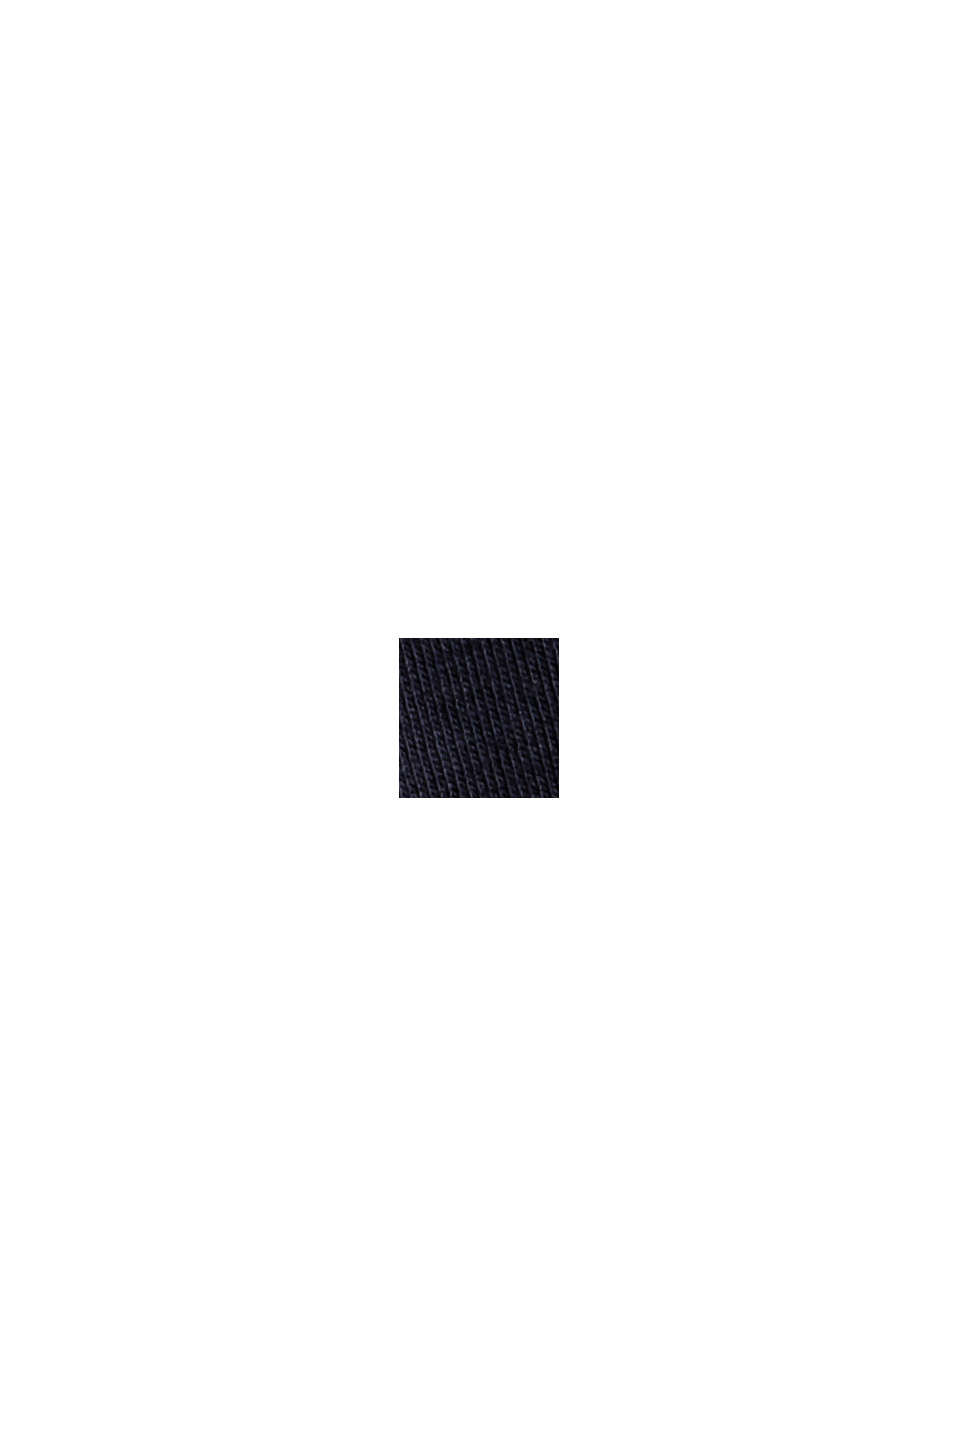 Långärmad tröja med polokrage, ekologisk bomull, NAVY, swatch